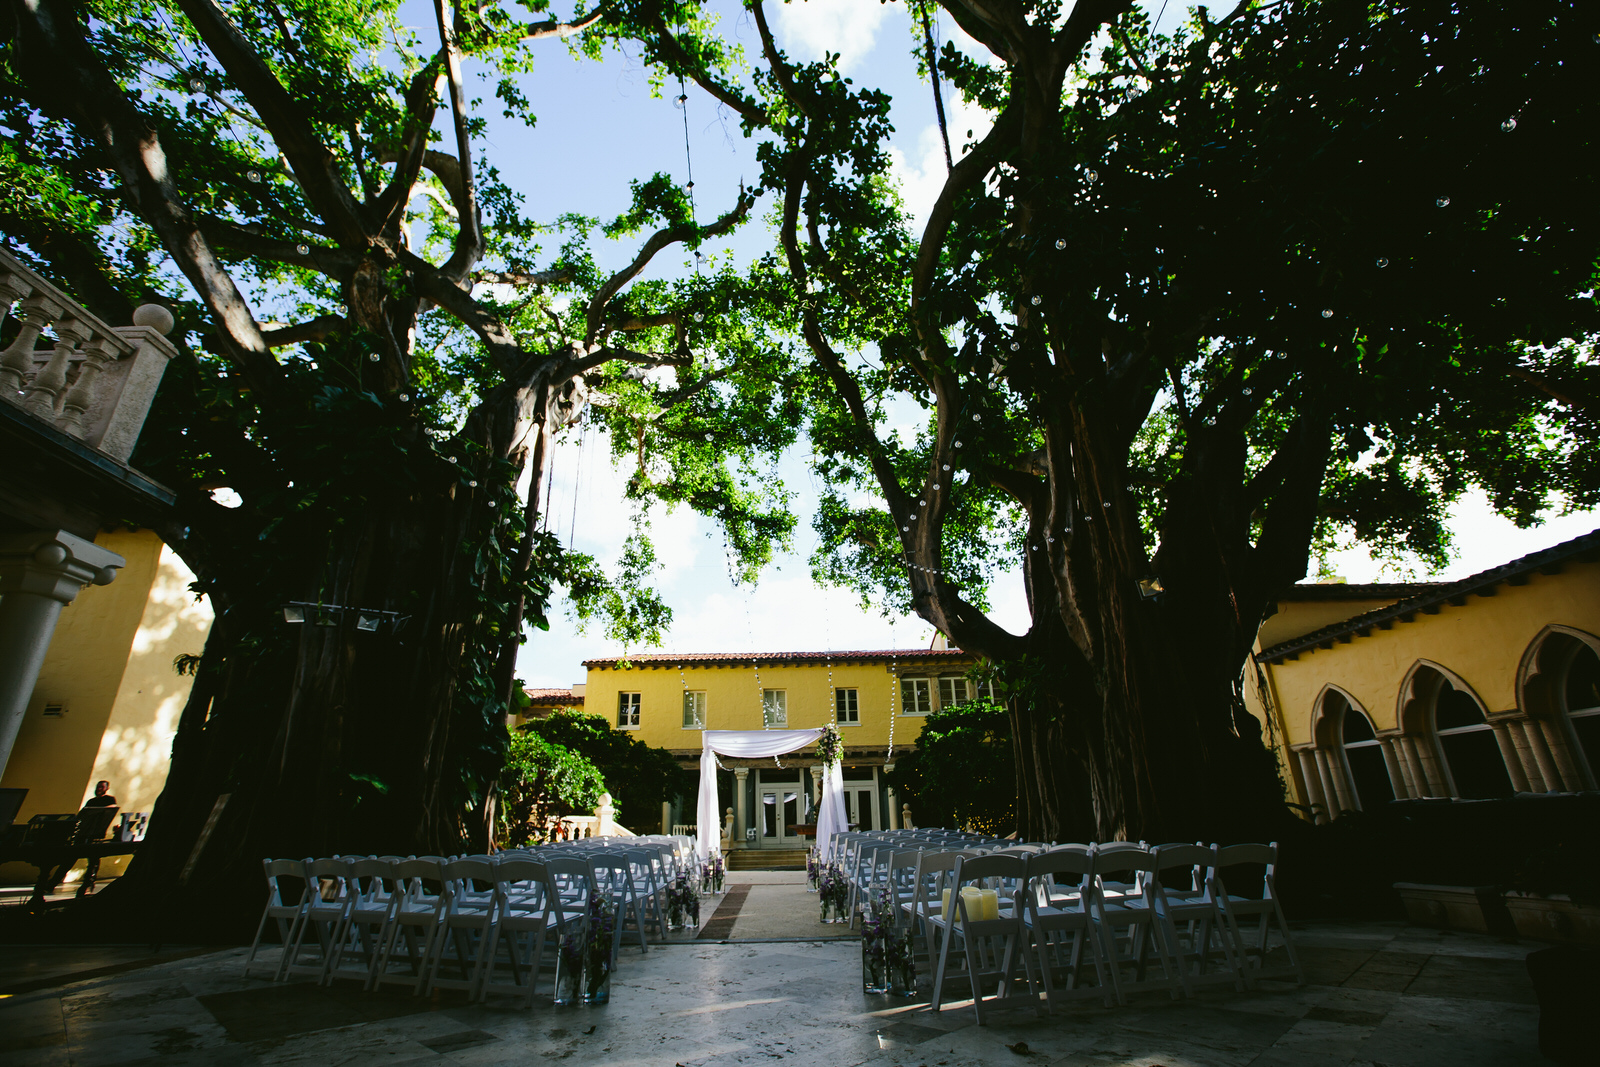 the_addison_wedding_venue_tiny_house_photo_outdoor_ceremony_florida_weddings.jpg